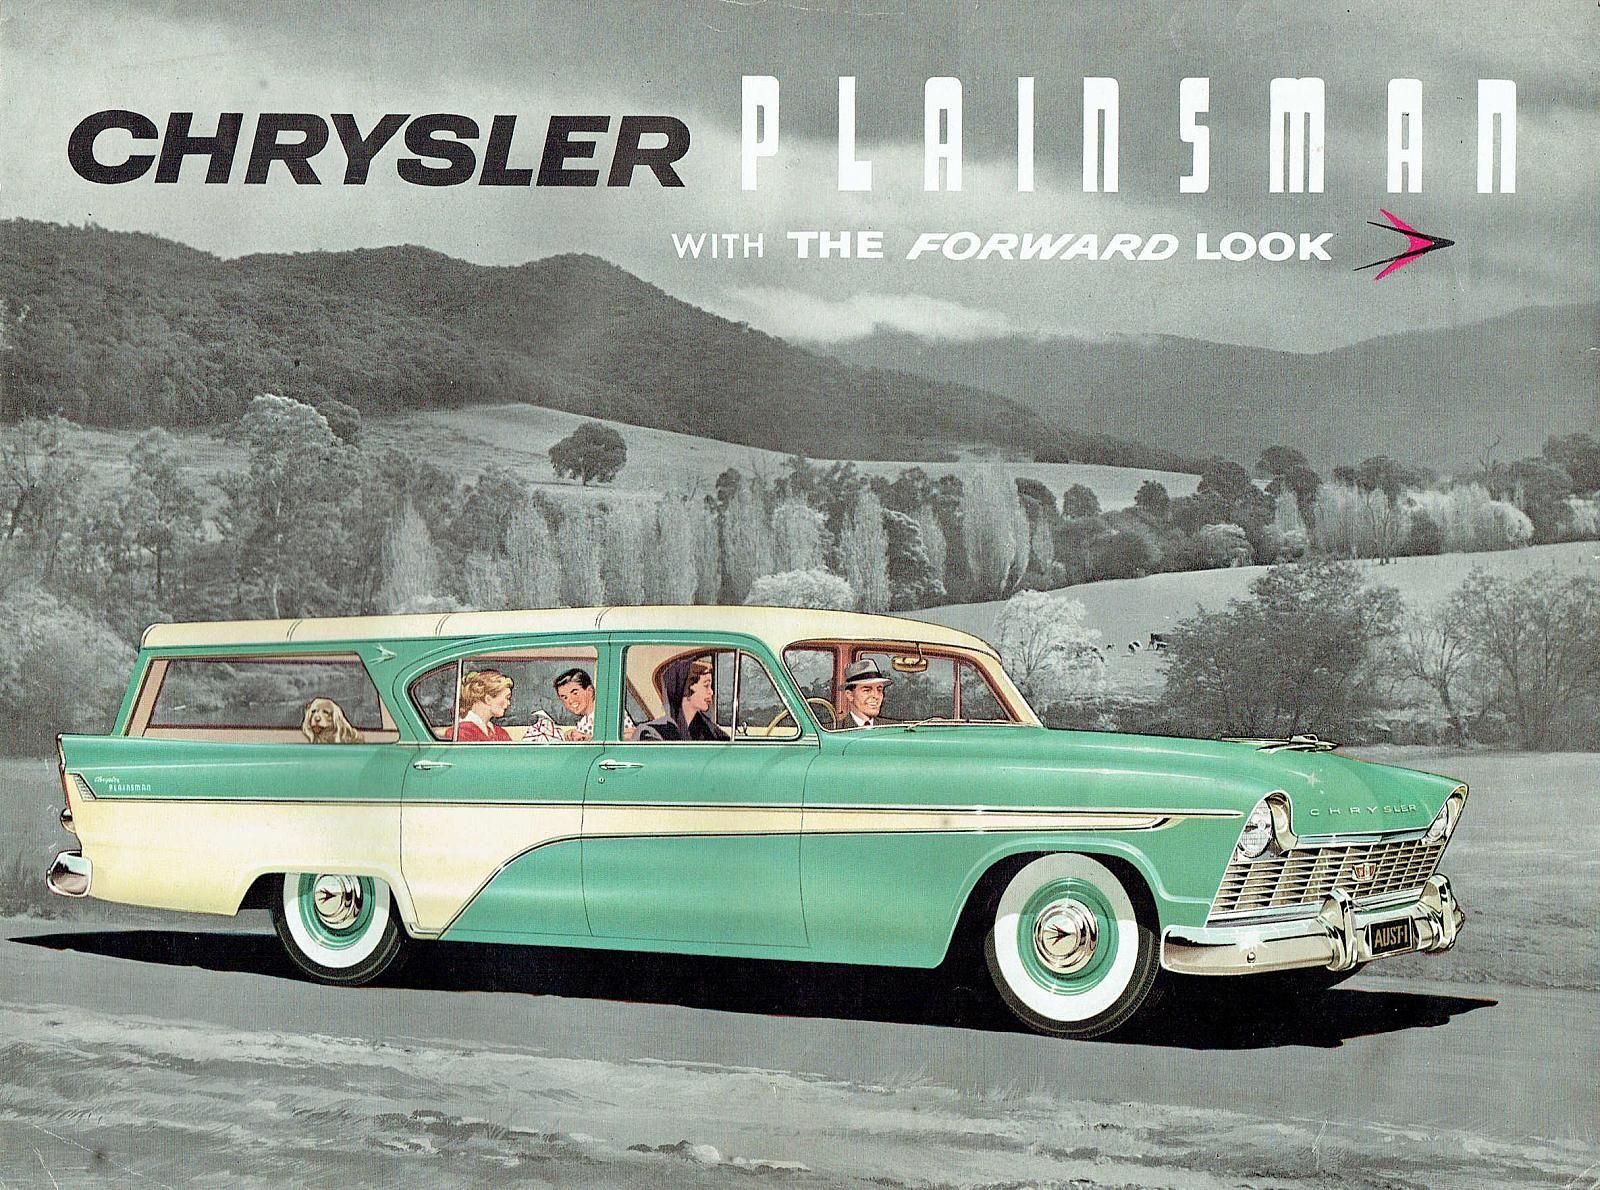 1956 ford customline wagon old car hunt - 1958 Chrysler Ap1 Plainsman Wagon The Ap1 Chrysler Royal Was Released In 1957 But